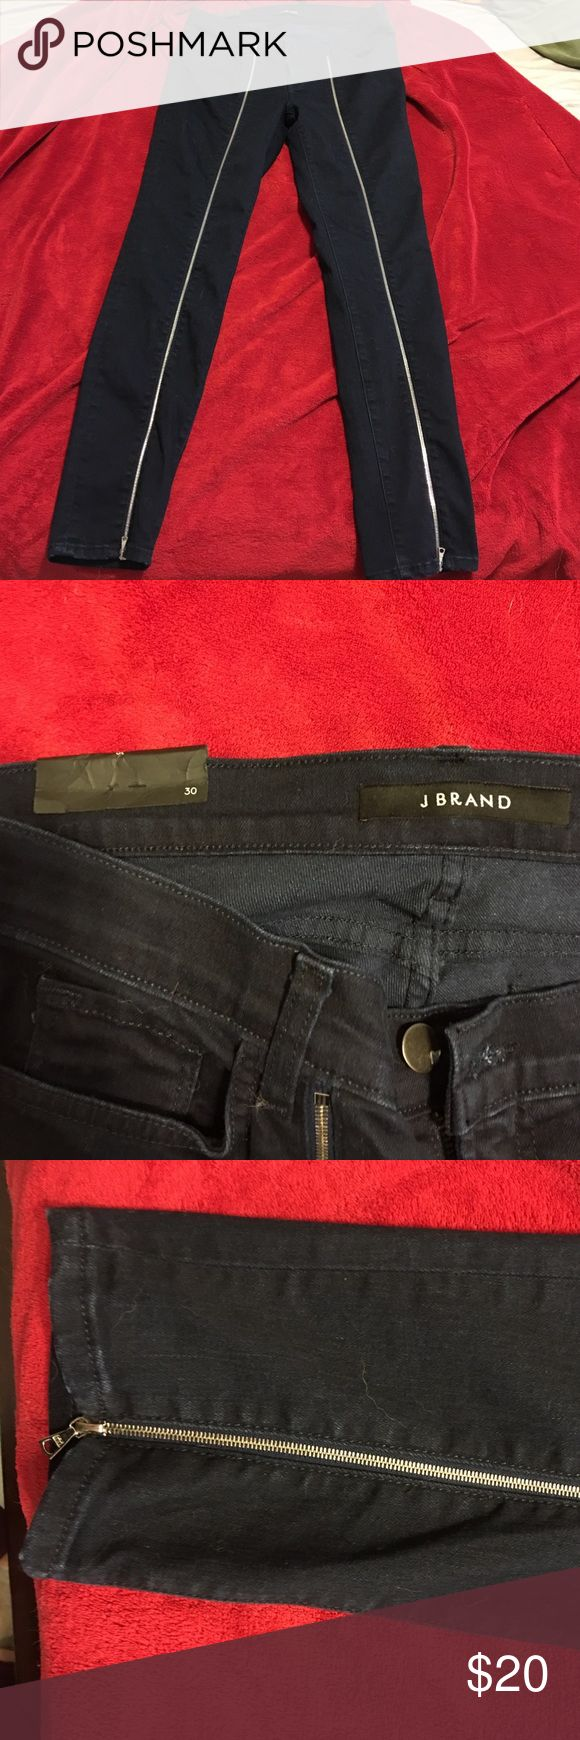 J Brand zipper detail skinny pants Never worn JBrand jeans with zipper detail. J Brand Jeans Skinny